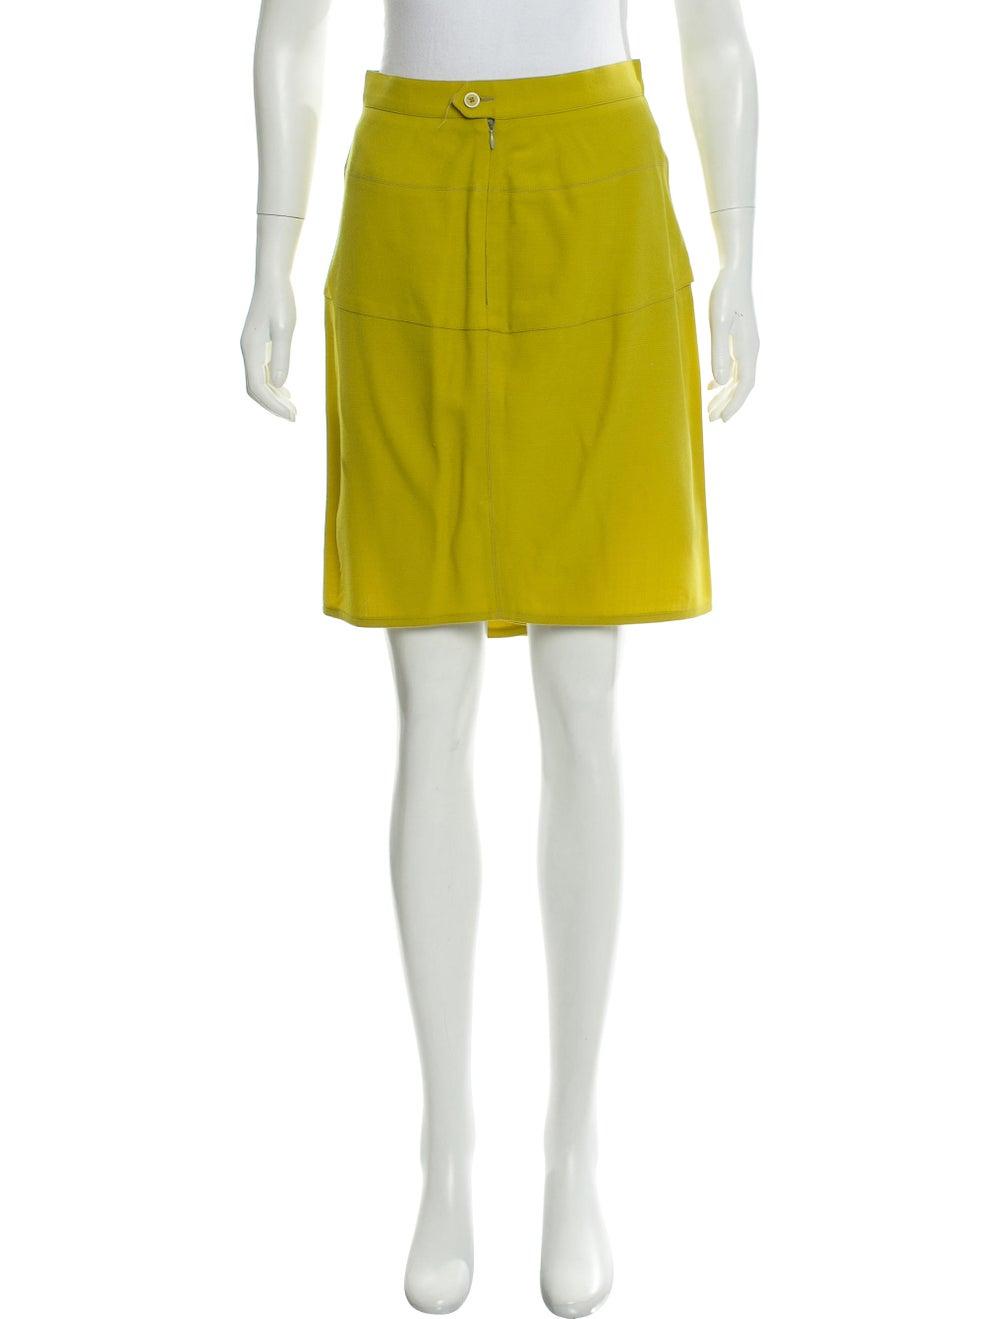 Alaïa Wool Knee-Length Skirt Chartreuse - image 1